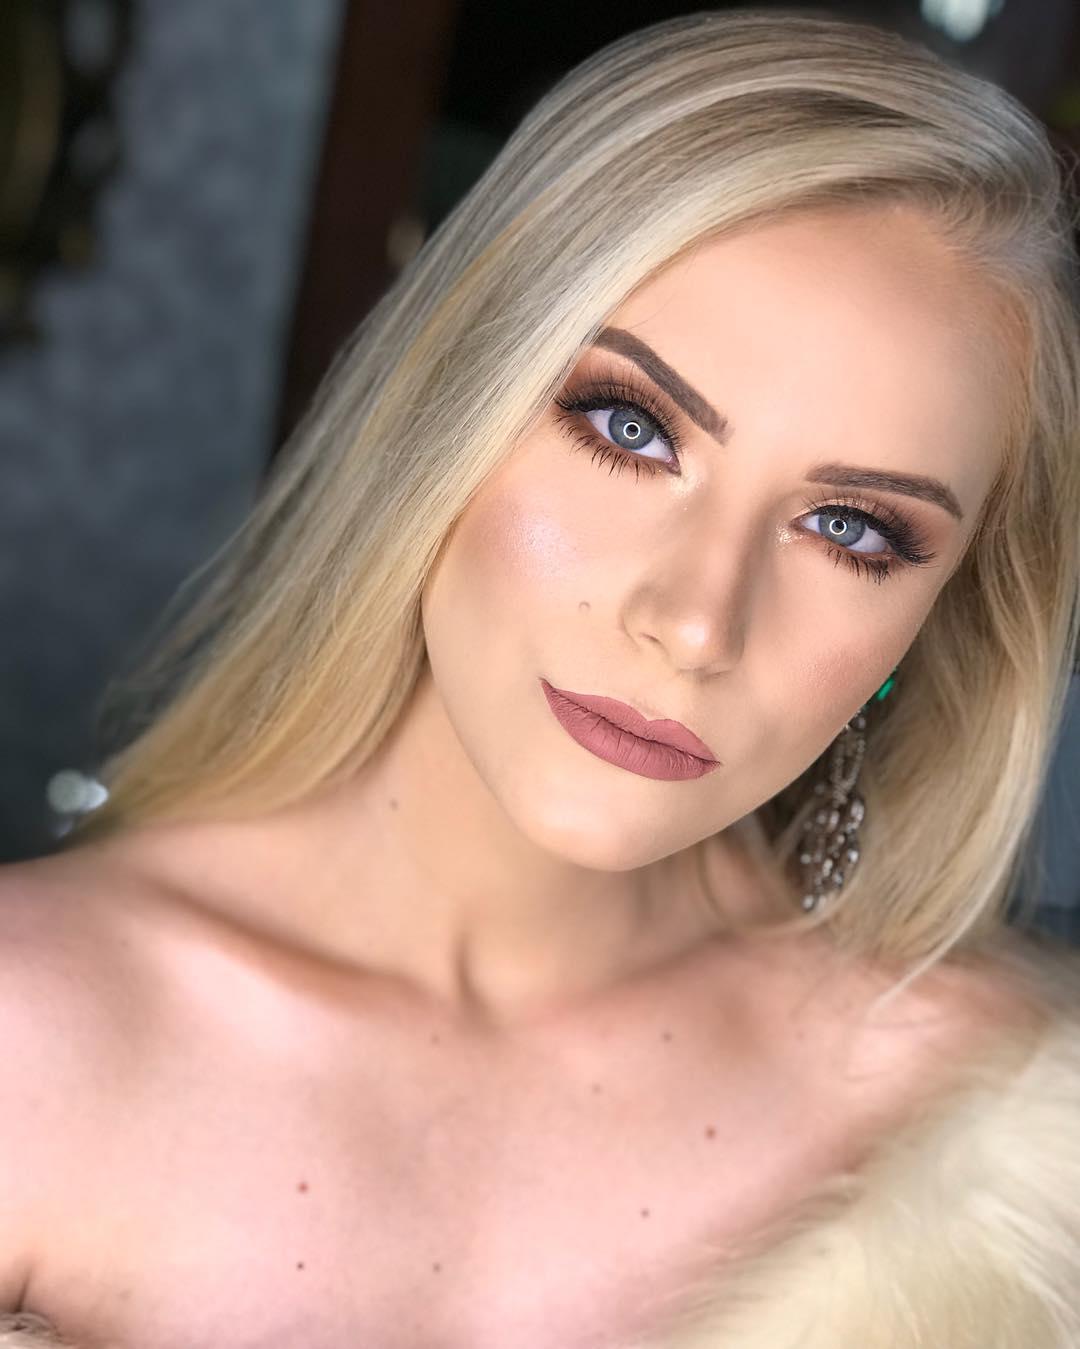 amanda pegoraro , miss brasil de las americas 2019. 47126211